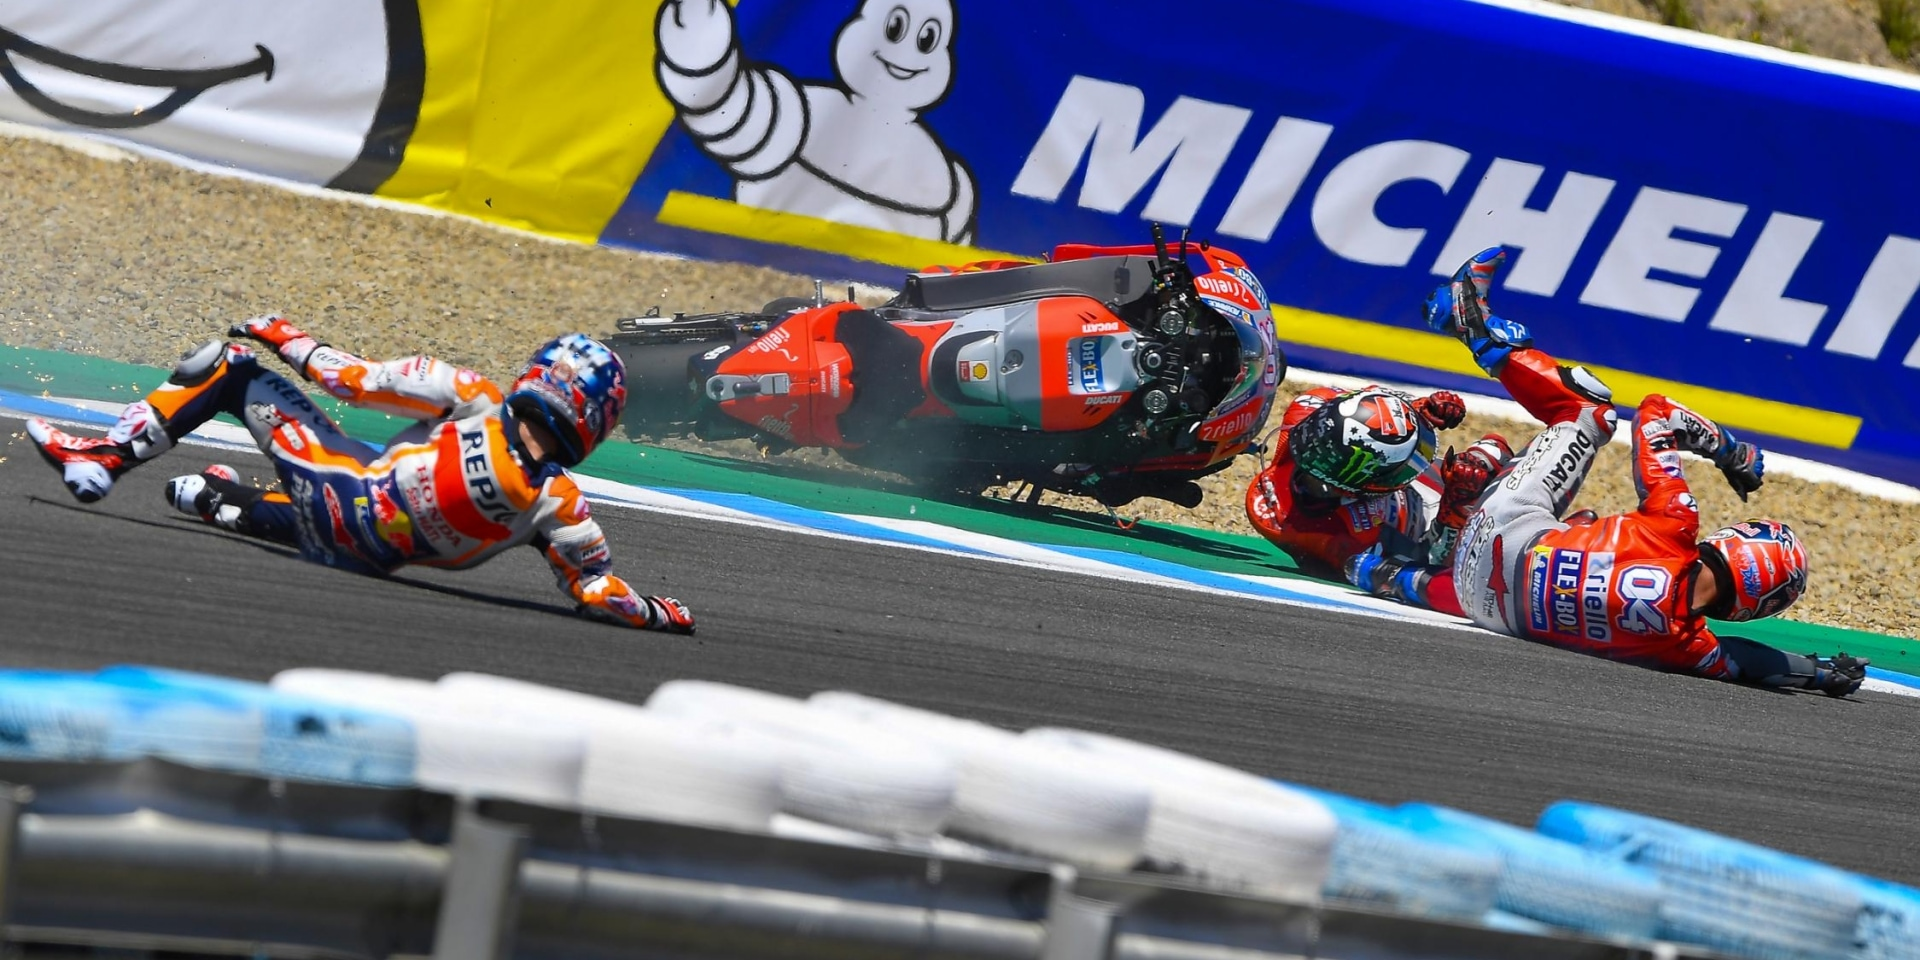 Jerez意外三連撞!Pedrosa、Lorenzo、Dovizioso:沒有誰對誰錯